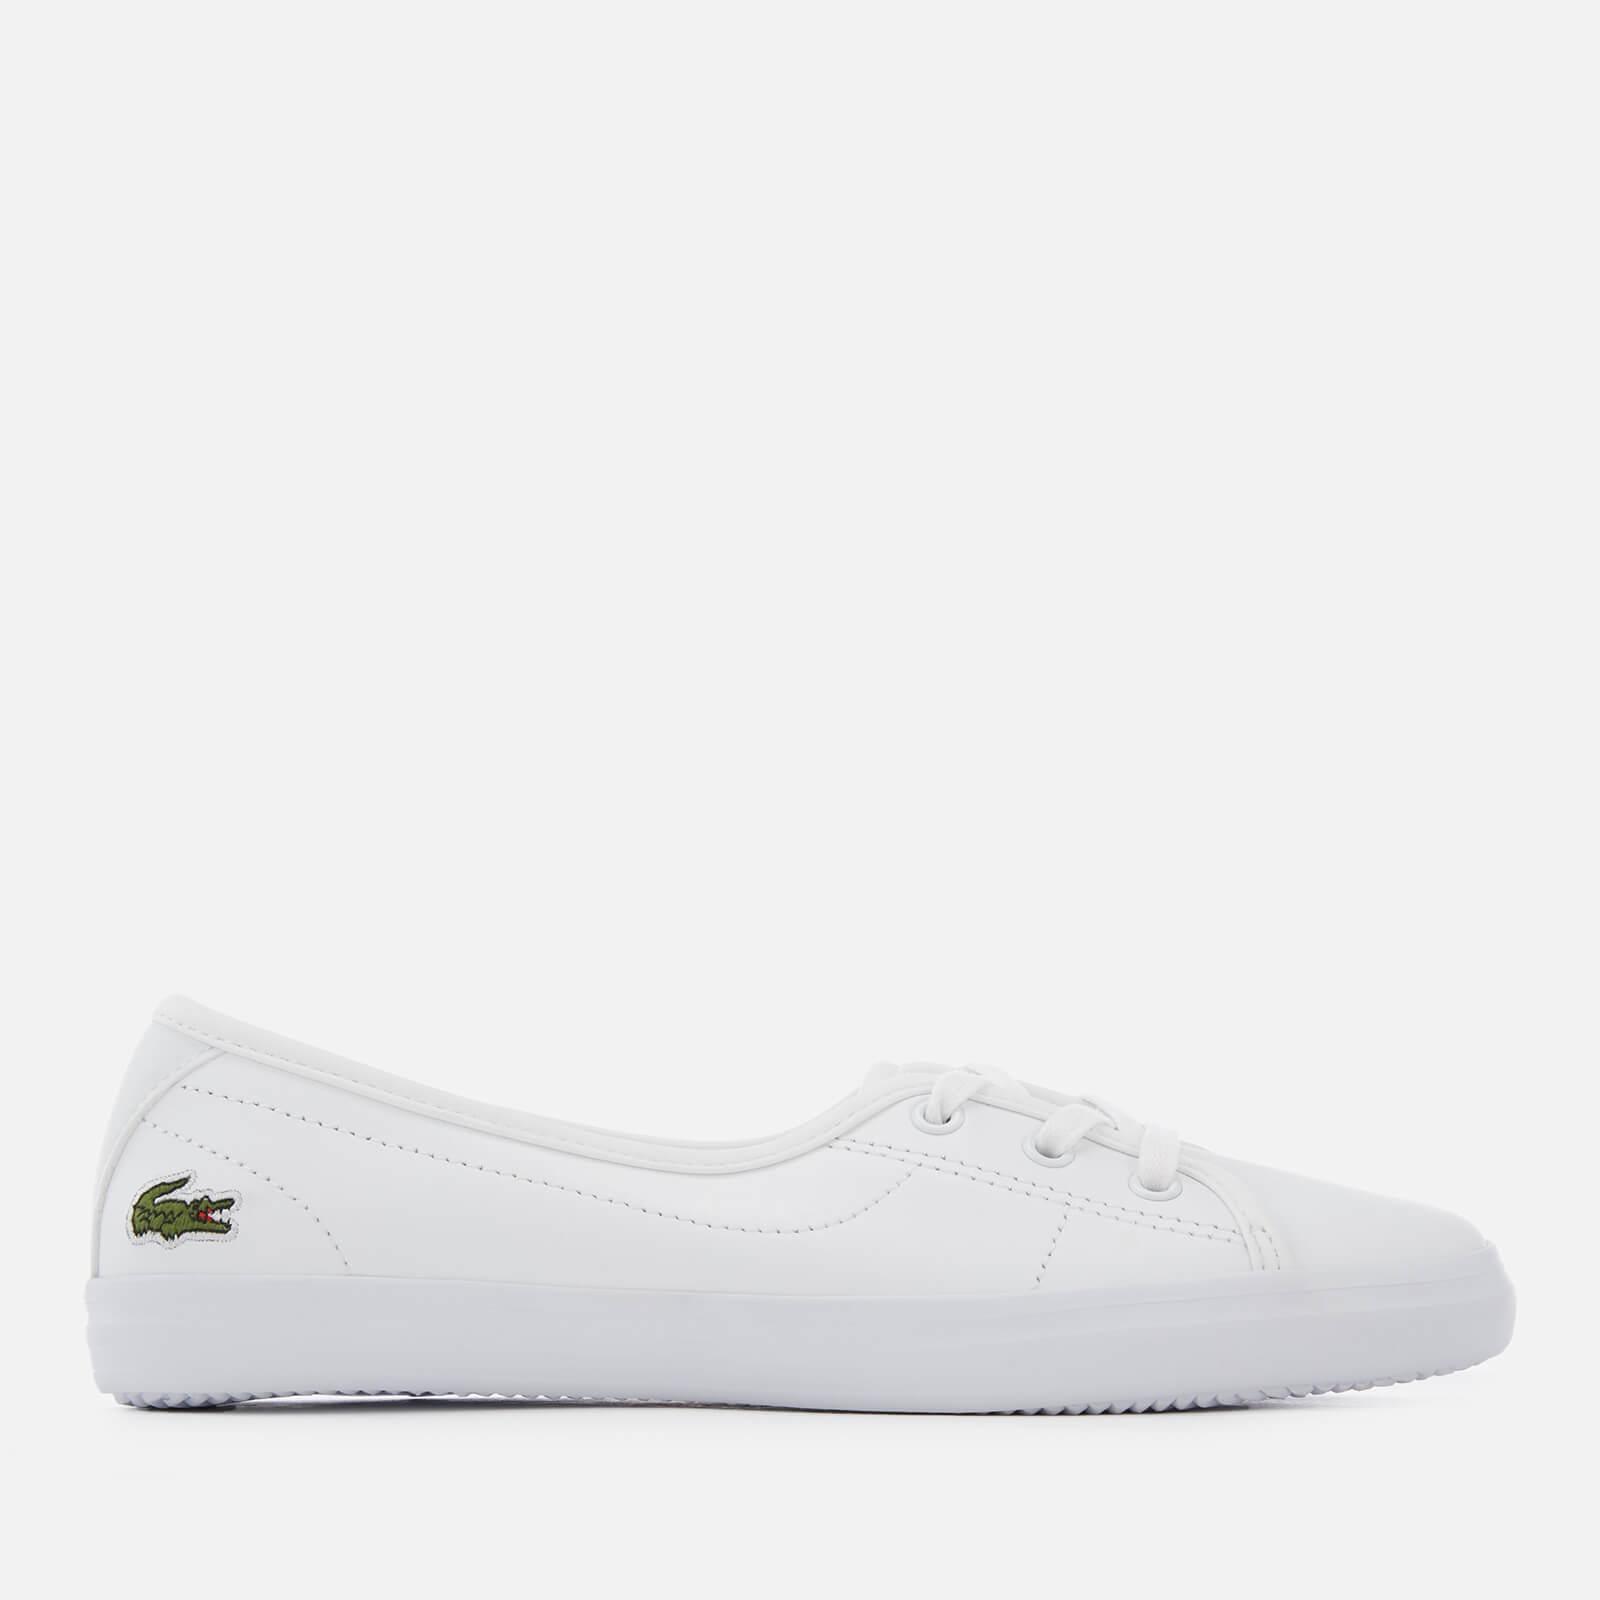 Lacoste Women's Ziane Chunky BL Leather 3-Eye Pumps - White/White - UK 7 - White/White